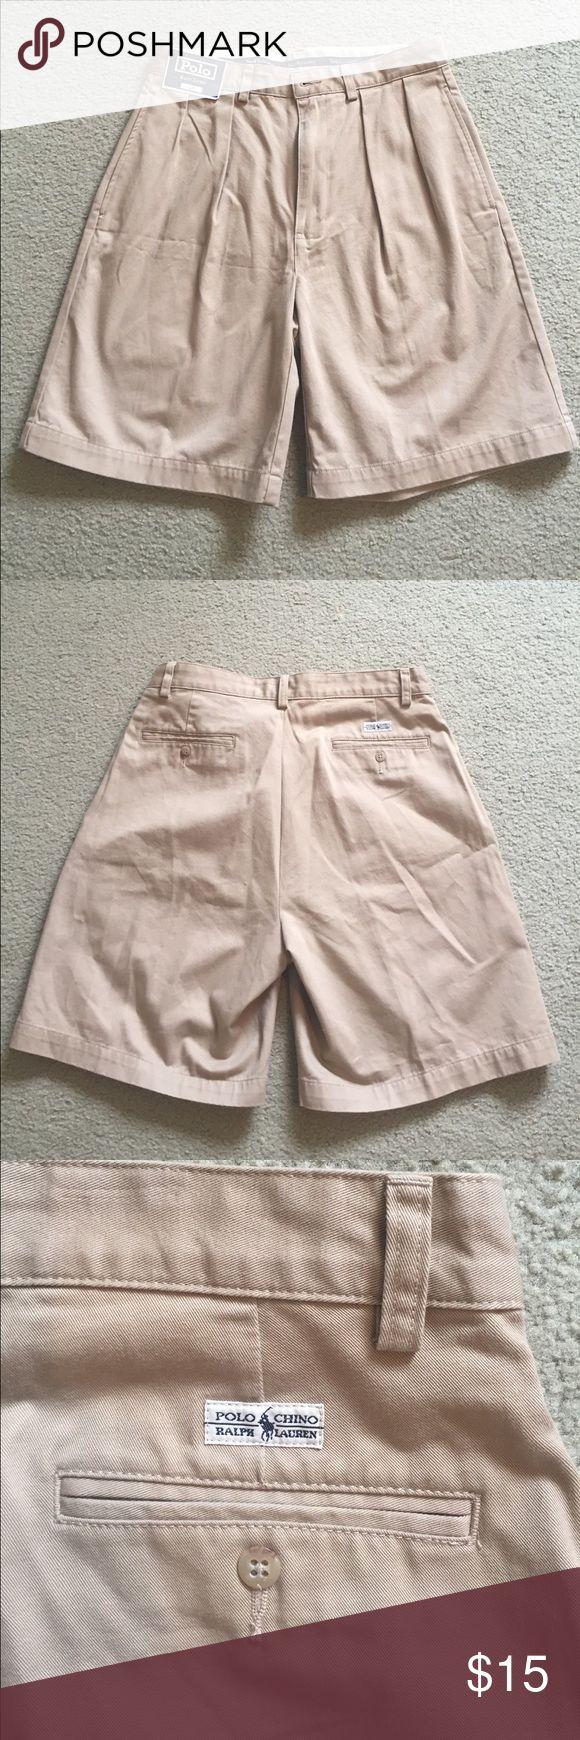 Men's Polo Ralph Lauren chino shorts Men's Polo Ralph Lauren new chino shorts. Never worn. Polo by Ralph Lauren Shorts